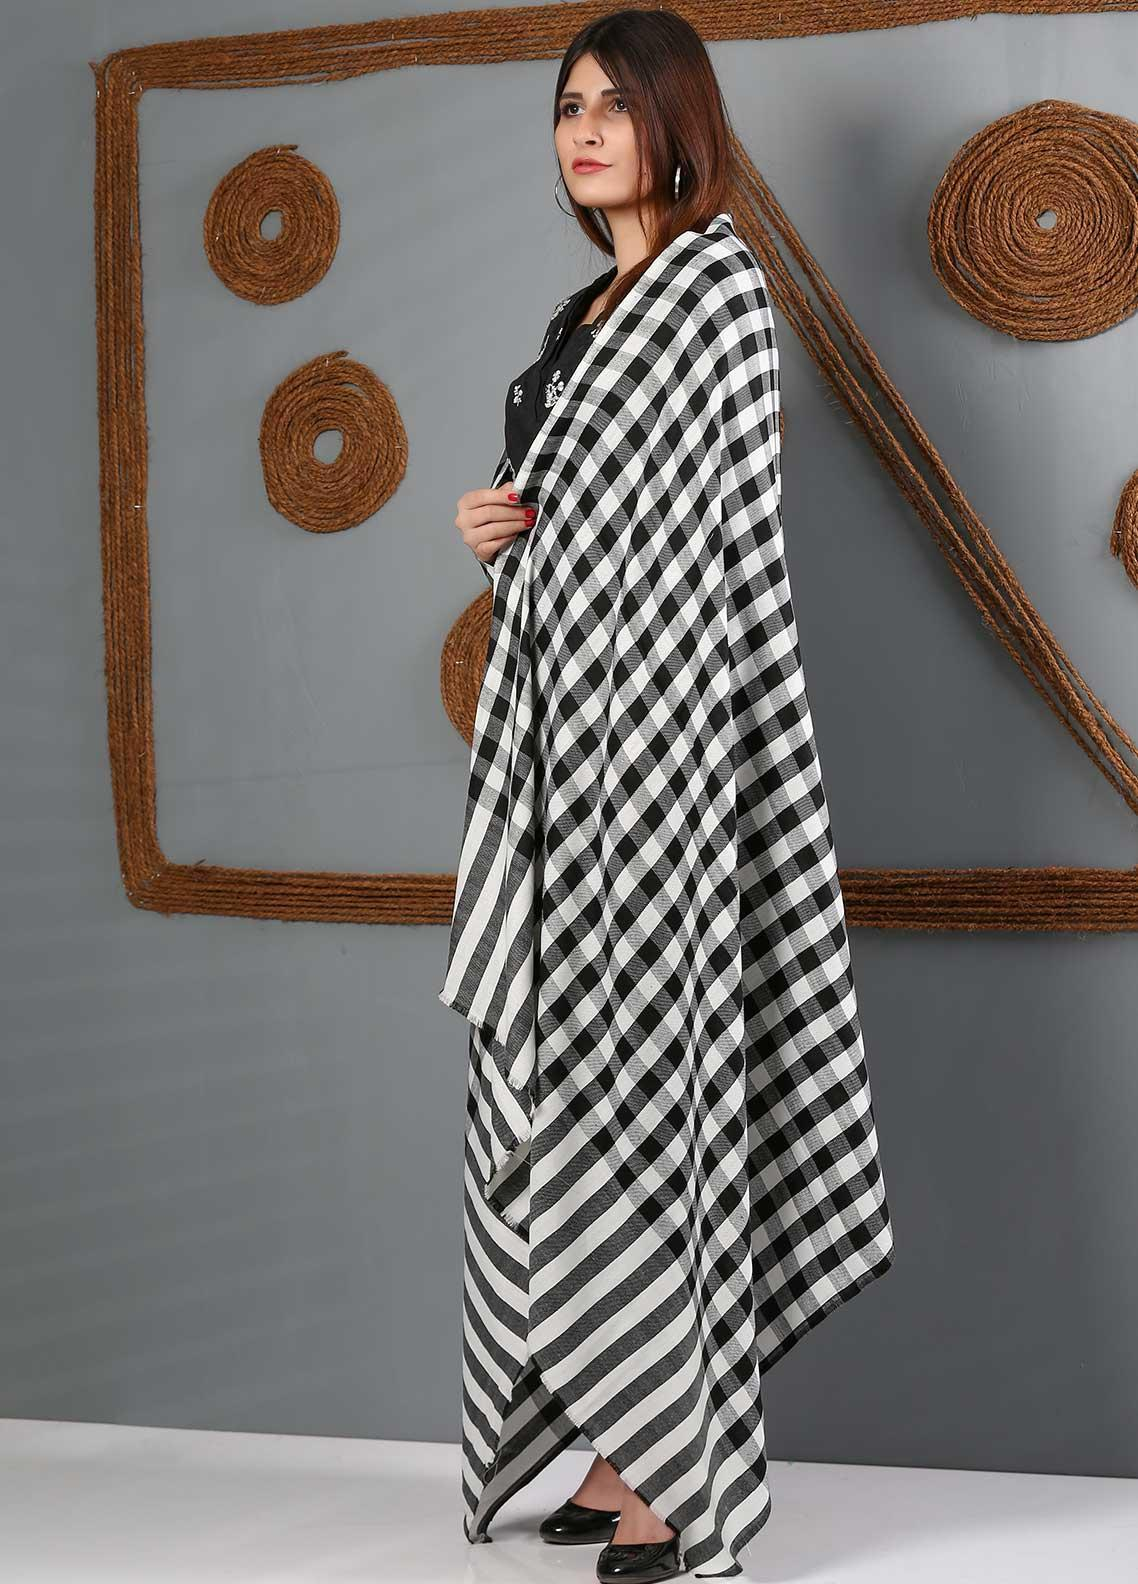 Sanaulla Exclusive Range Printed Woolen  Shawl SU21WS 334165 - Woolen Shawls